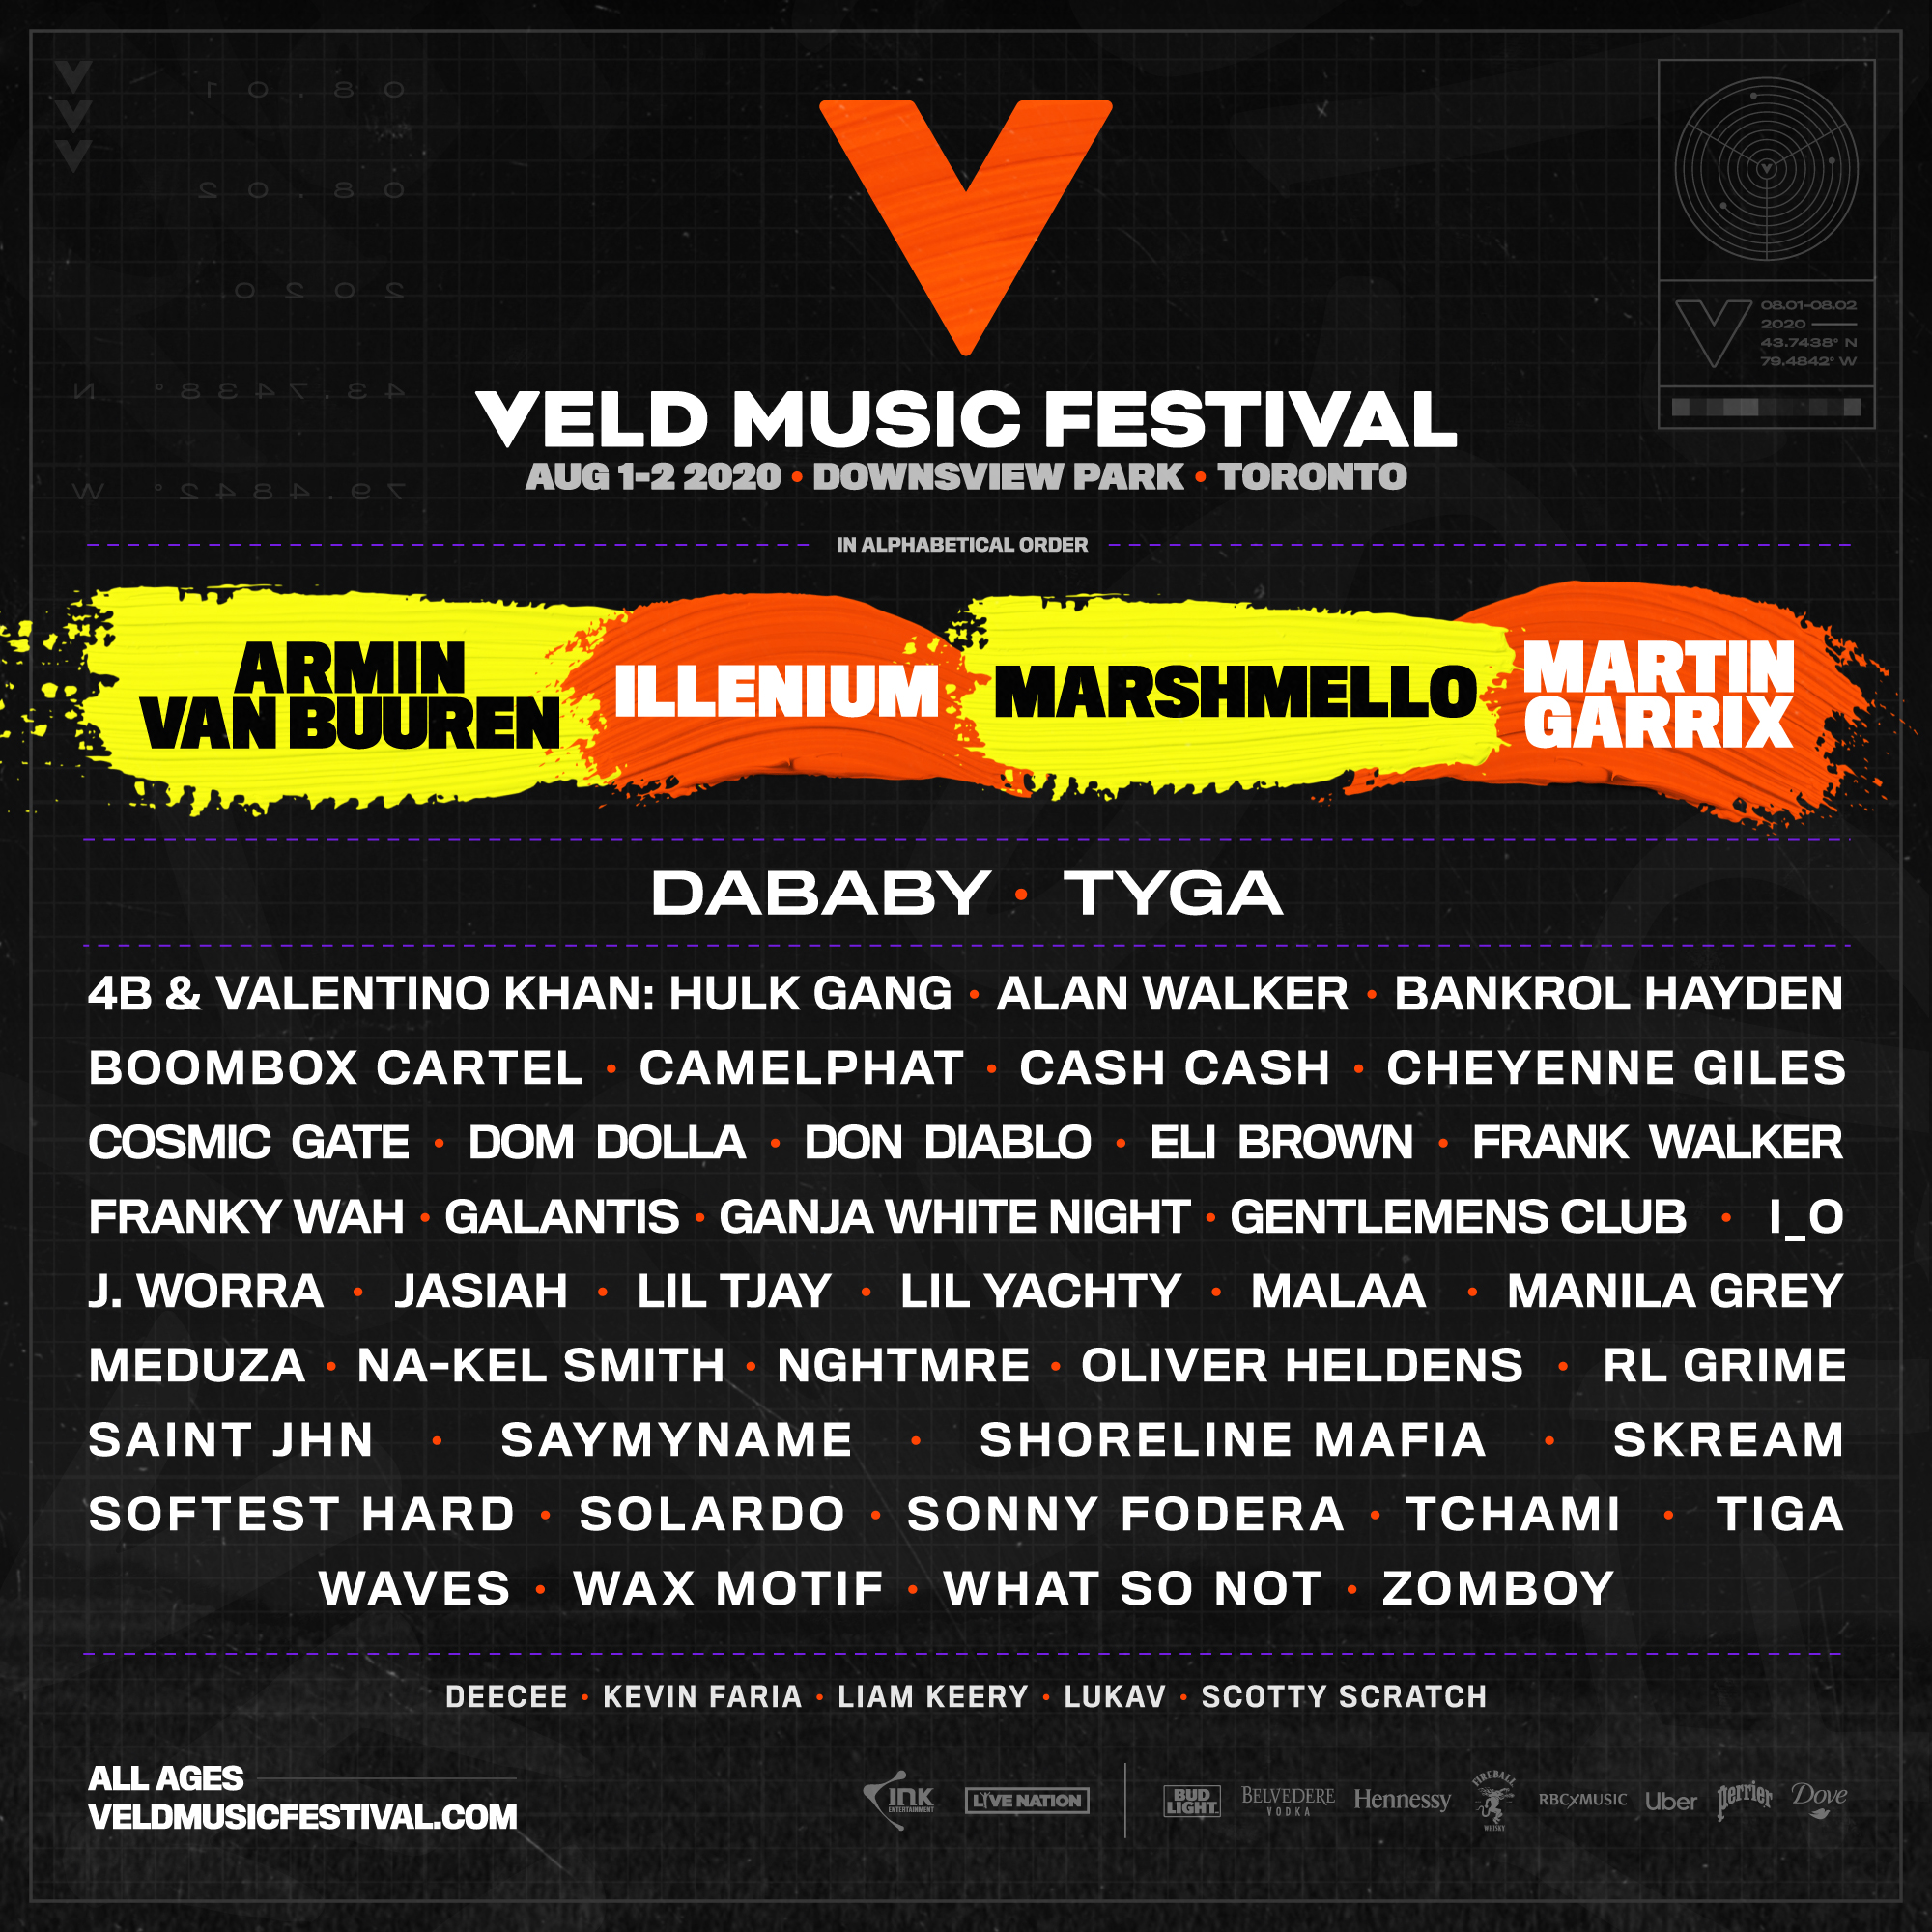 Veld Music Festival 2020 Lineup - Toronto, Canada Music Festivals